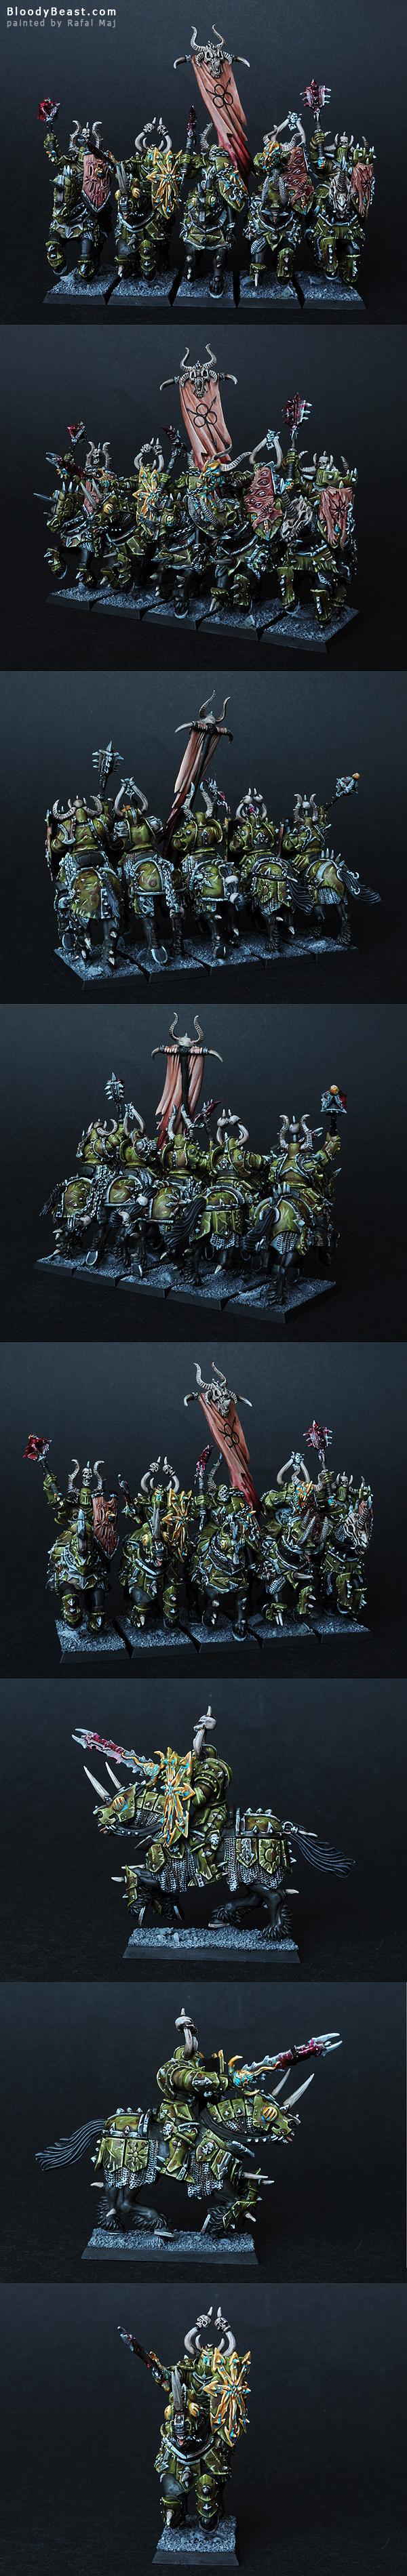 Chaos Knights Of Nurgle painted by Rafal Maj (BloodyBeast.com)